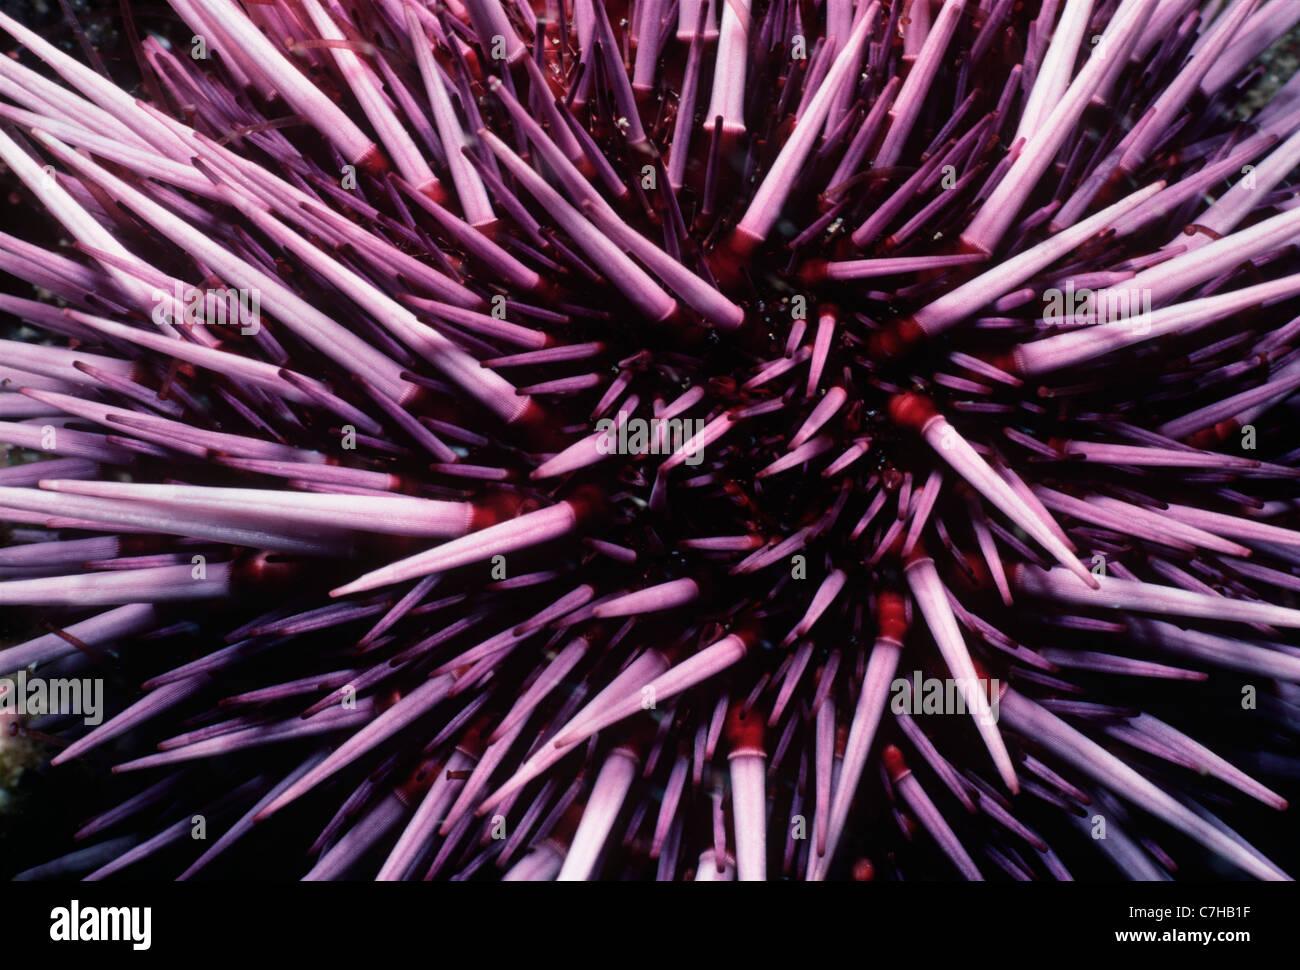 Purpur Seeigel (Strongylocentratus Purpuratus) ernähren sich von Seetang. Kanalinseln, Kalifornien (USA) - Stockbild